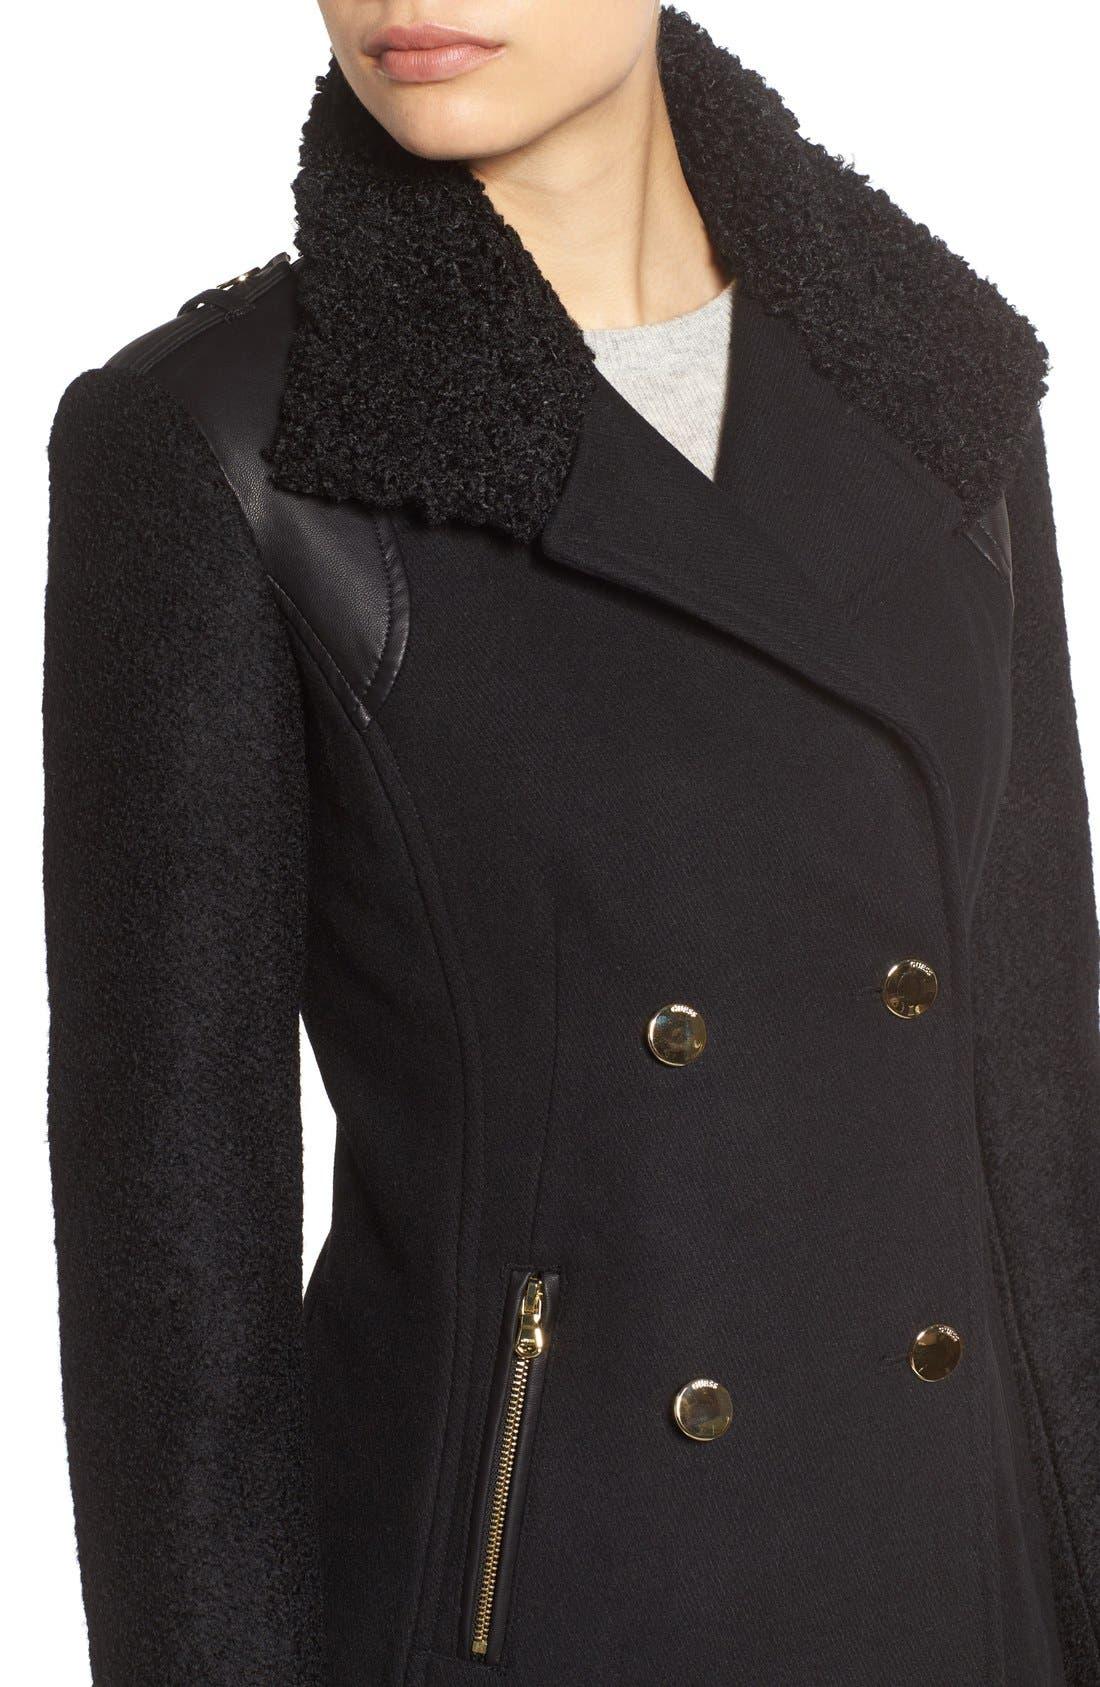 Bouclé Sleeve Wool Blend Military Coat,                             Alternate thumbnail 4, color,                             Black